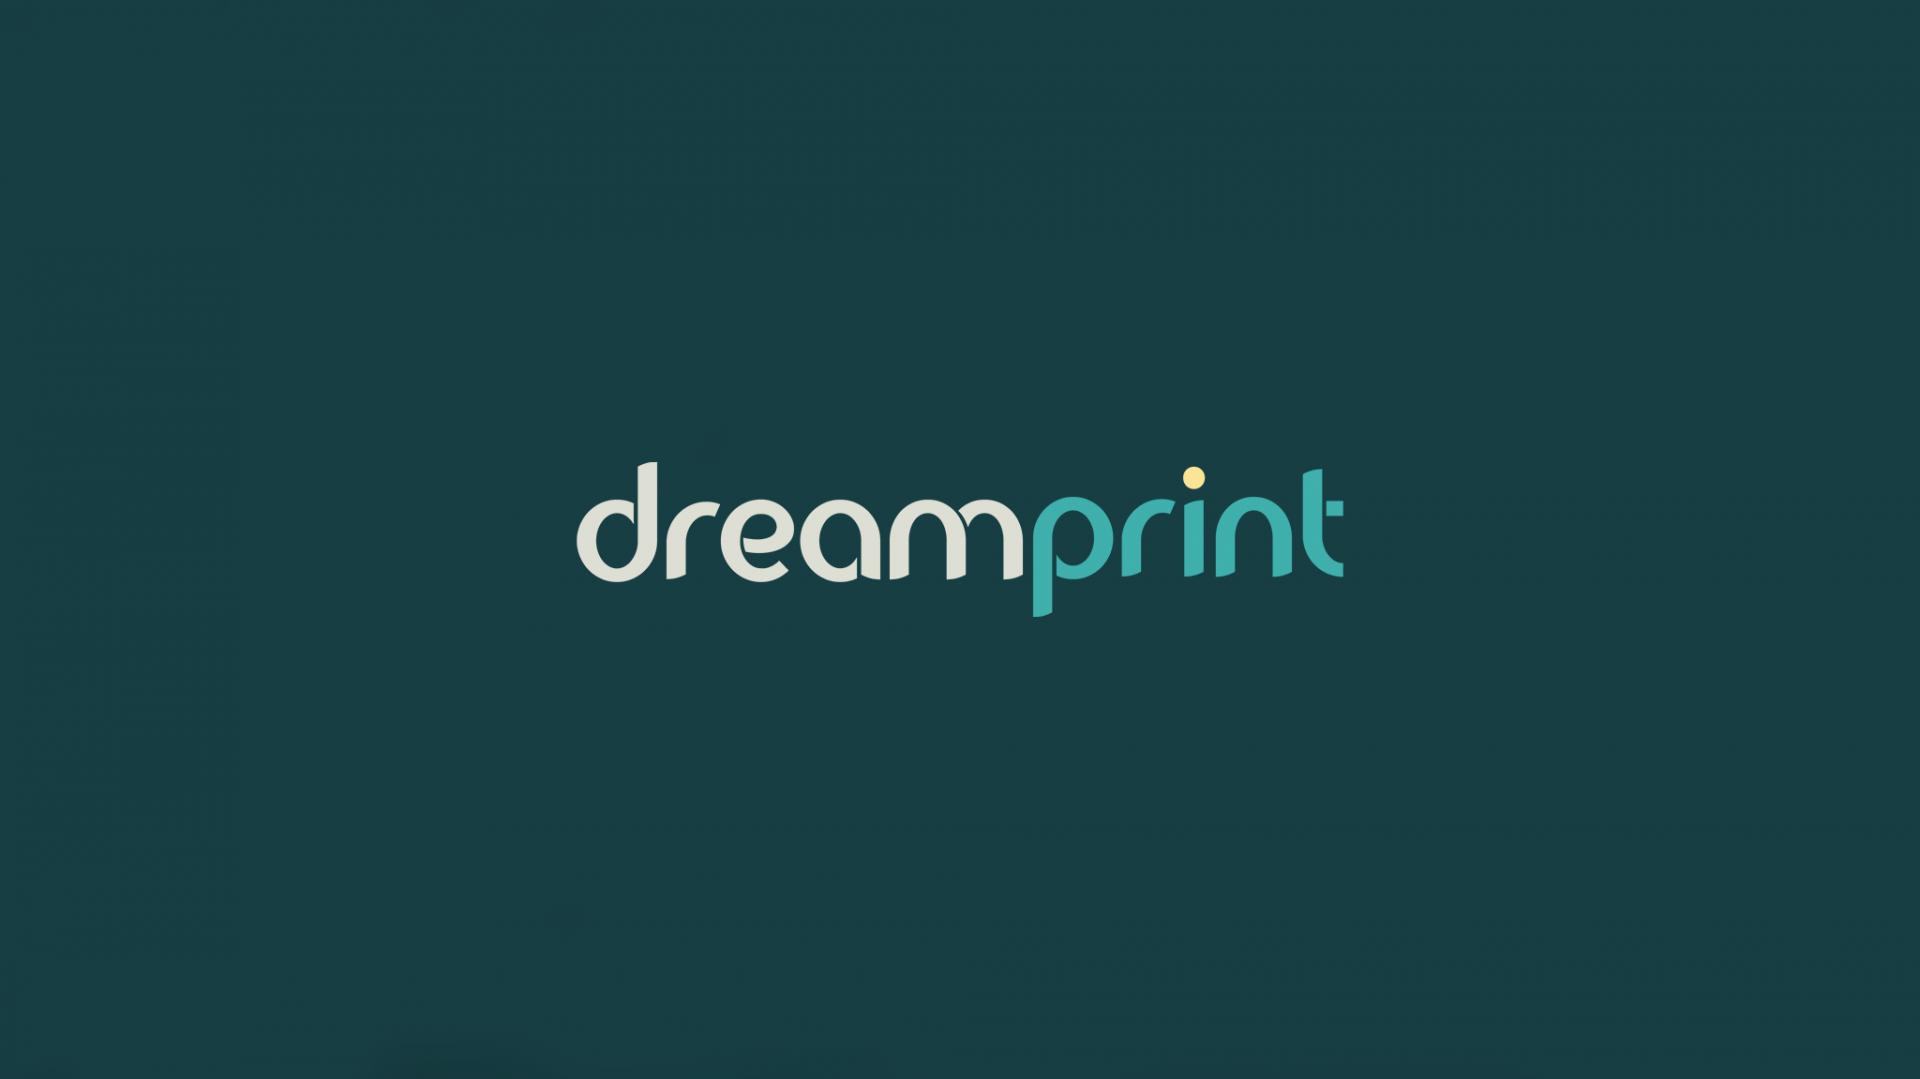 Dreamprint